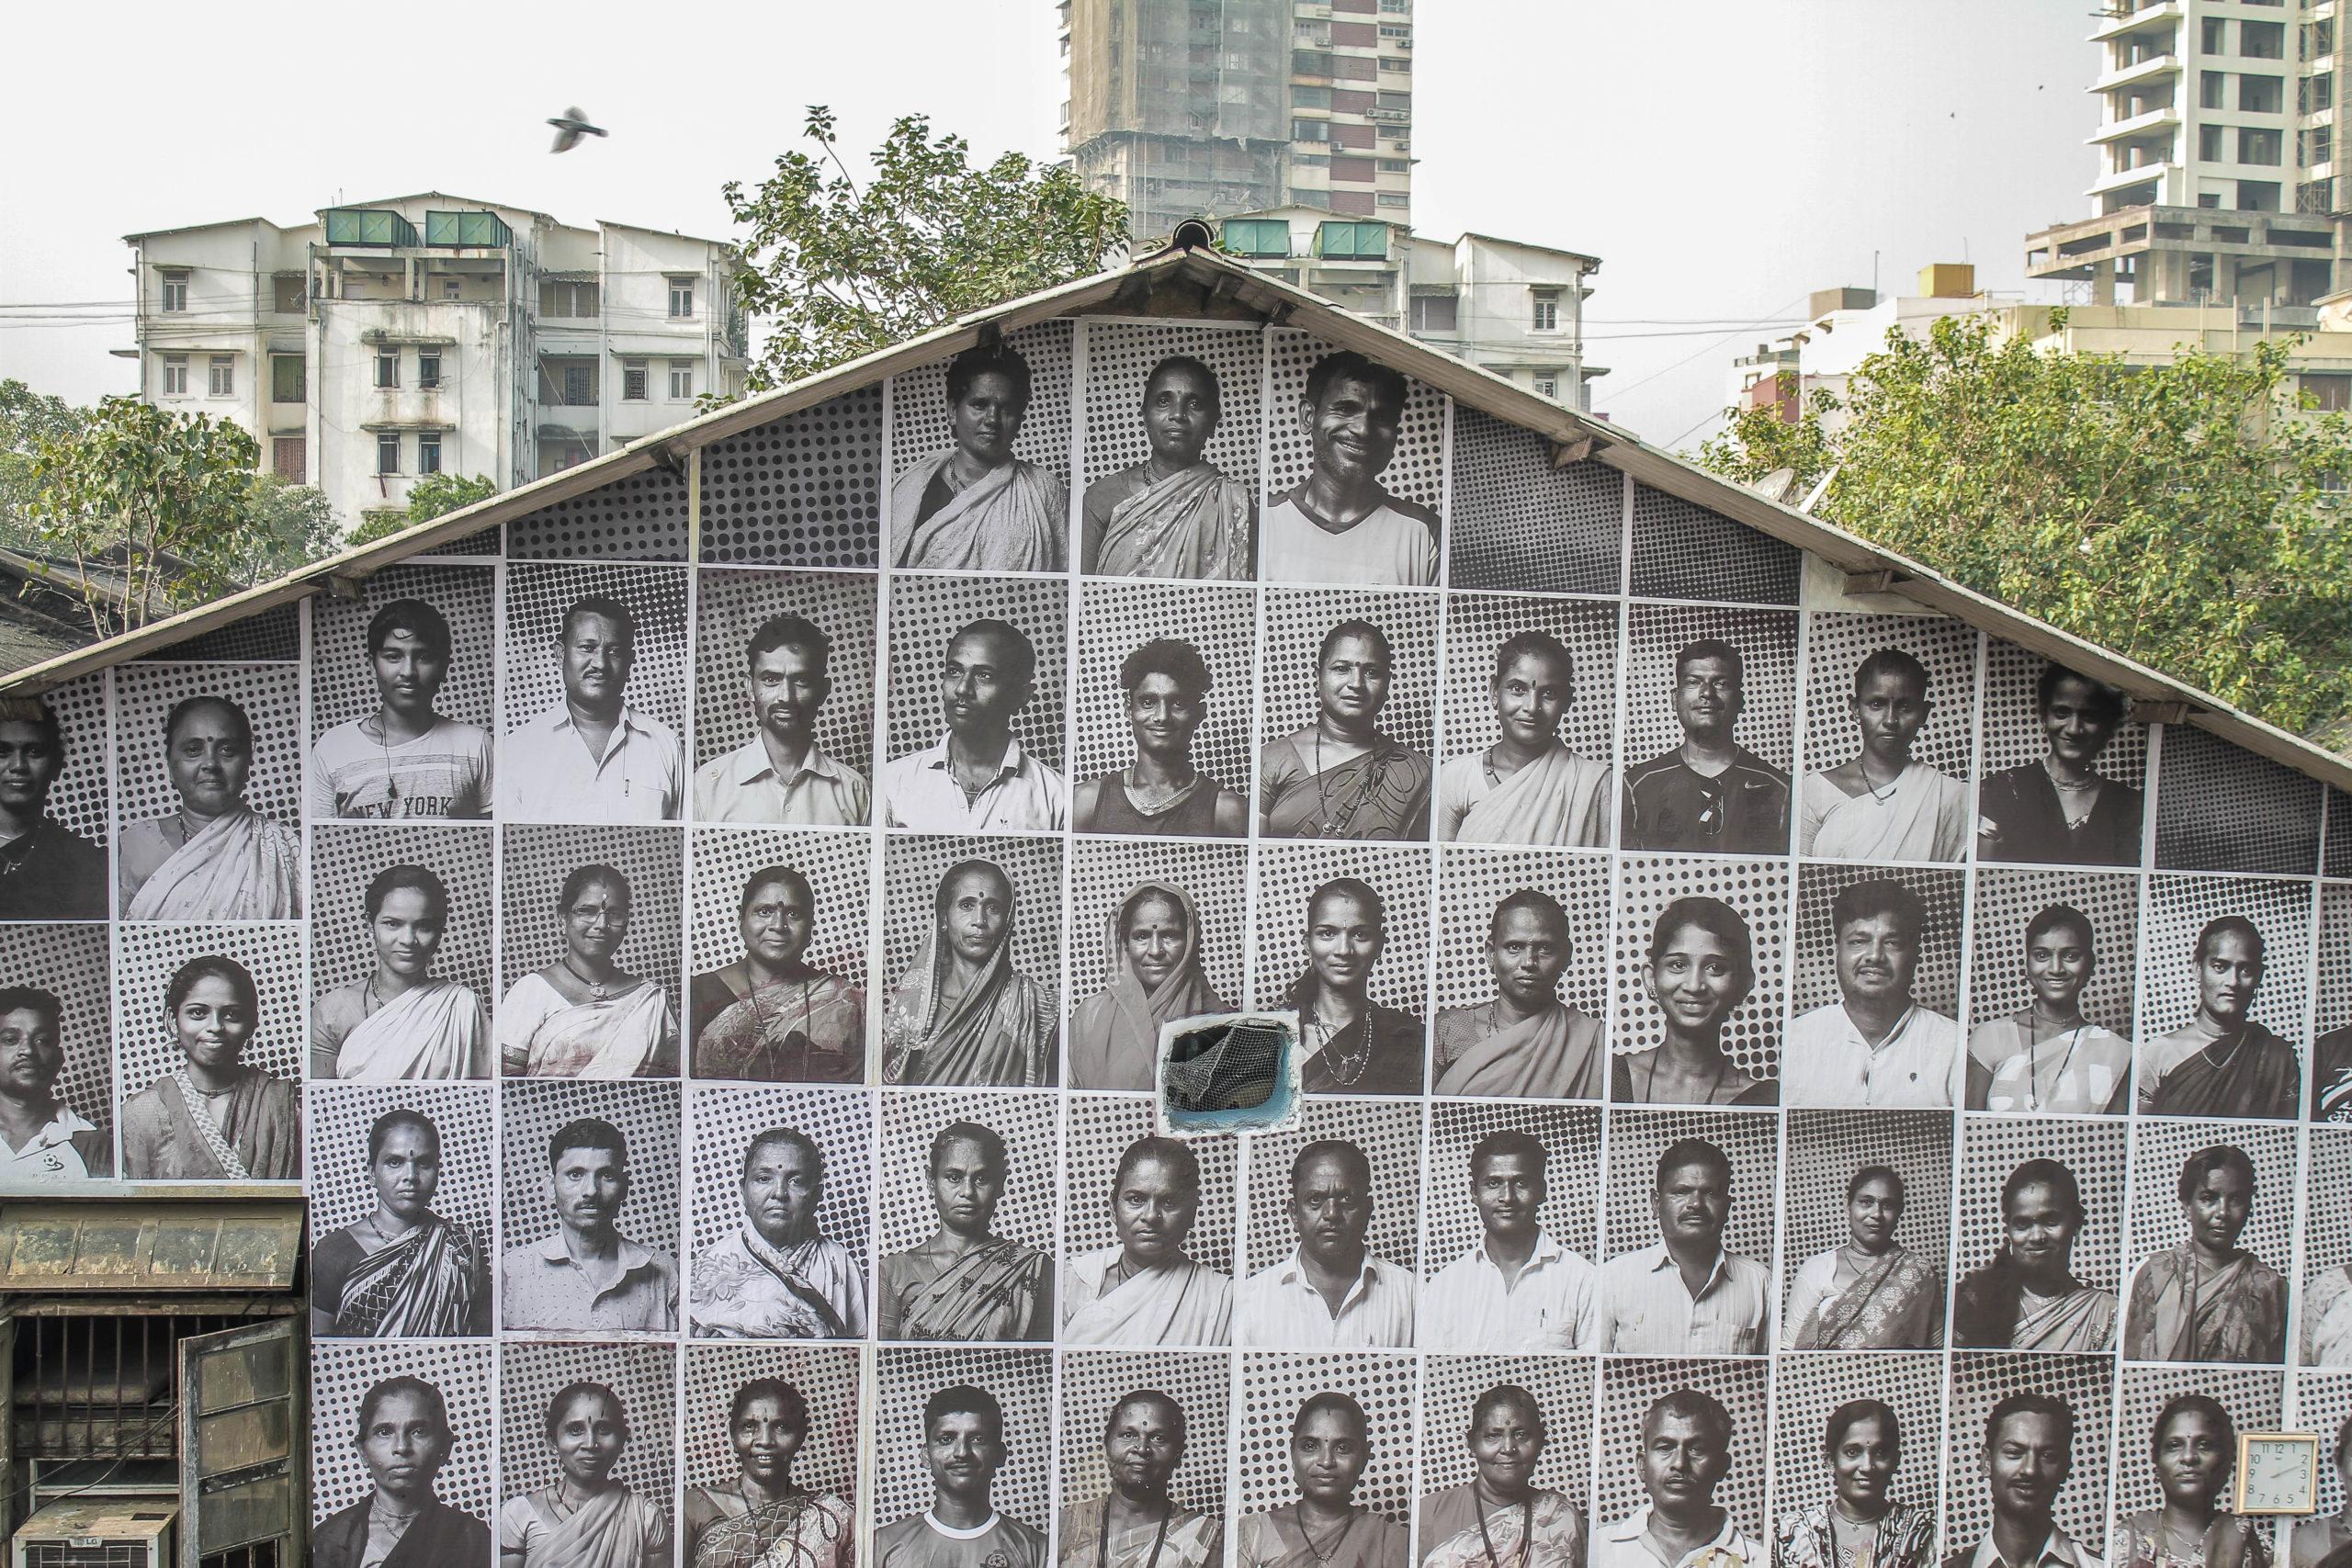 The Daily Edit - Sassoon Dock Art Project: Akshat Nauriyal